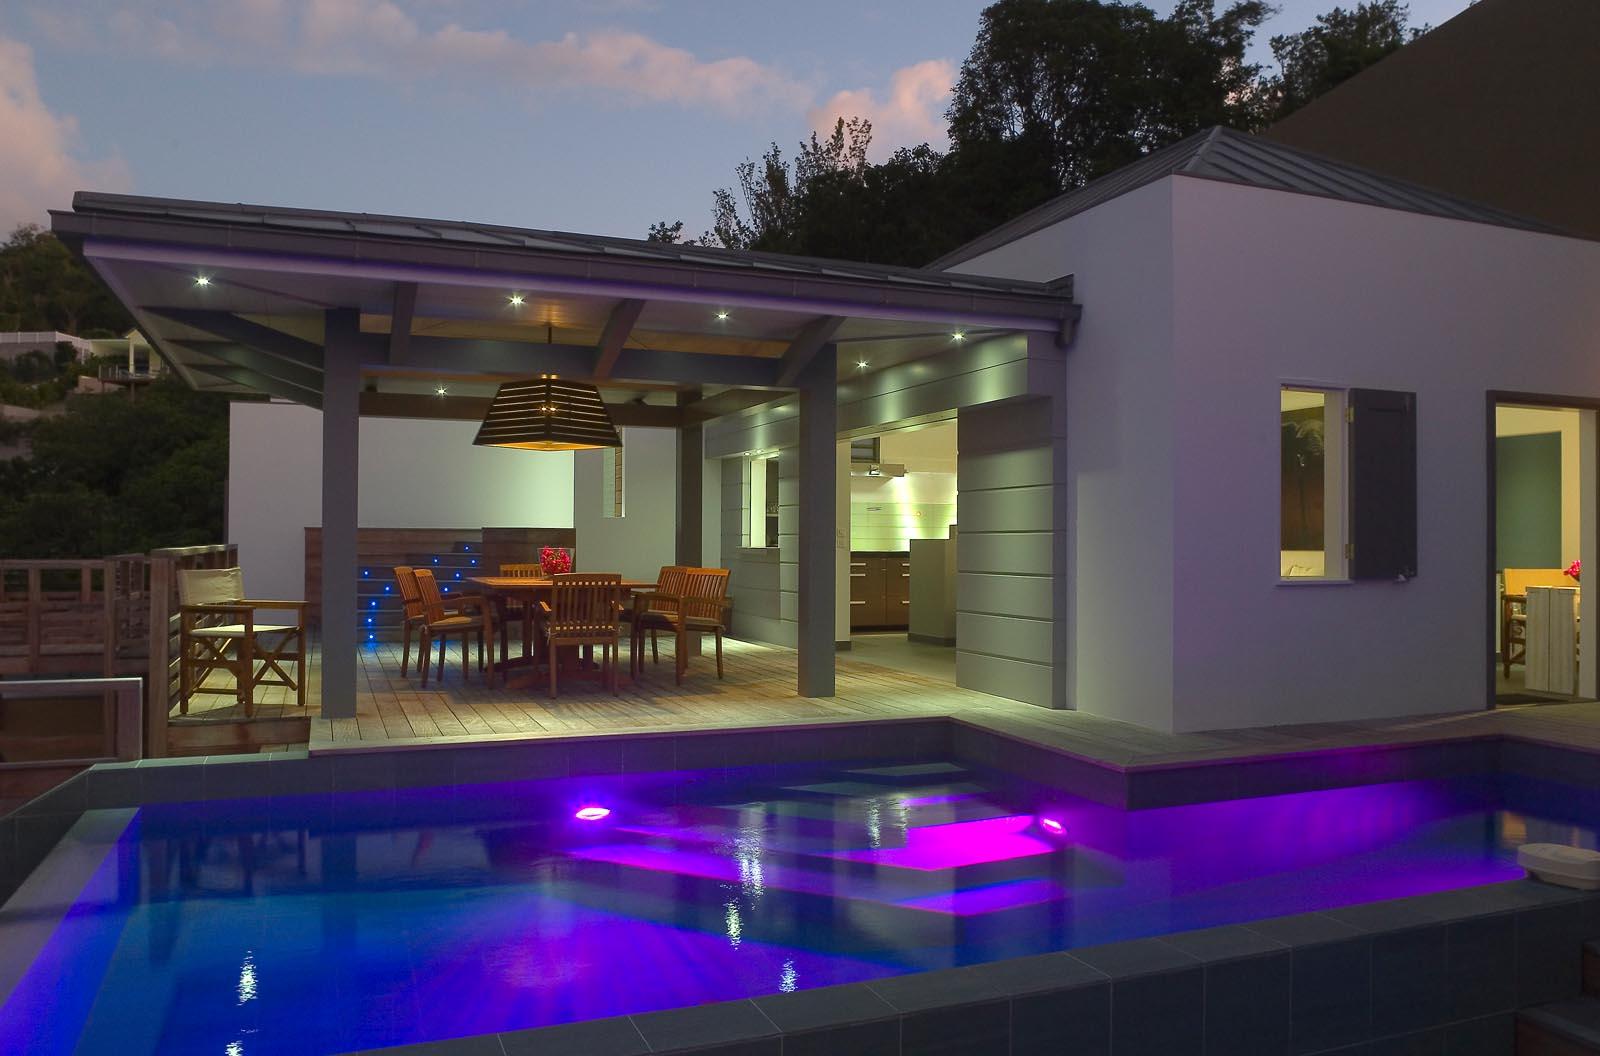 Modern Villa With Contemporary Interior Design 3 Bedrooms Swimming